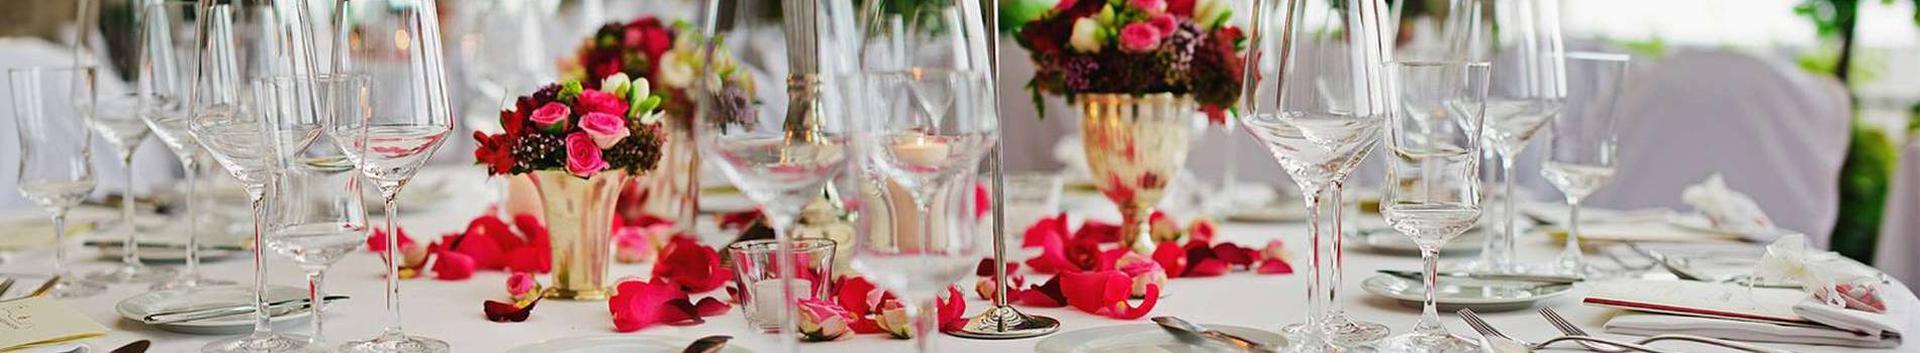 56101_toitlustus-restoran-jm-_97435017_xl.jpg